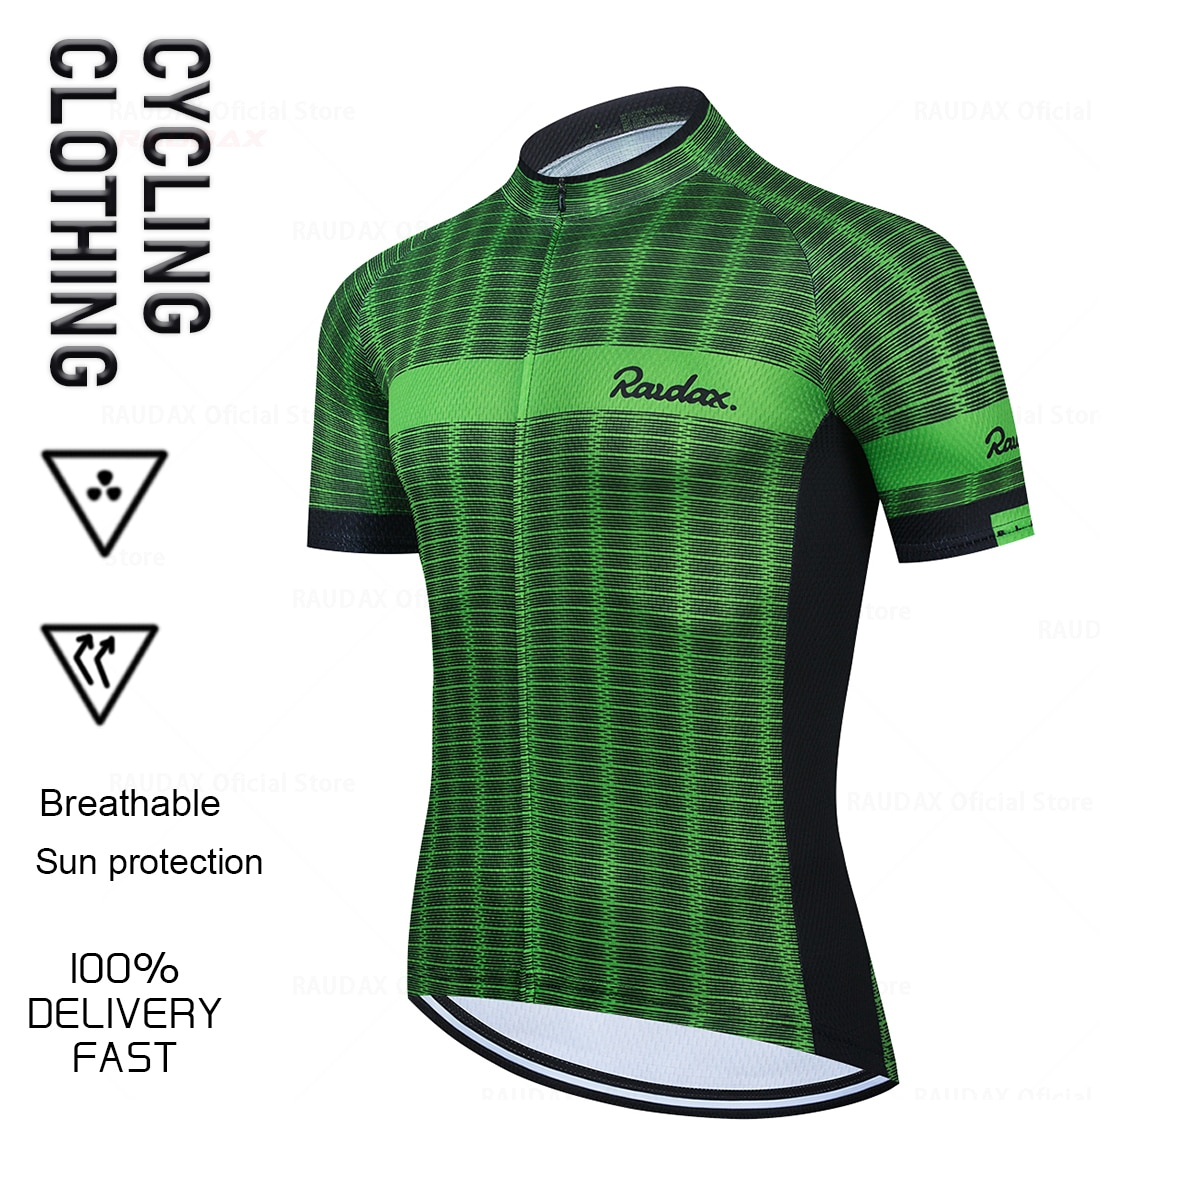 Giantful-Camiseta De manga corta para Hombre, Ropa De Ciclismo De Carretera, equipo...